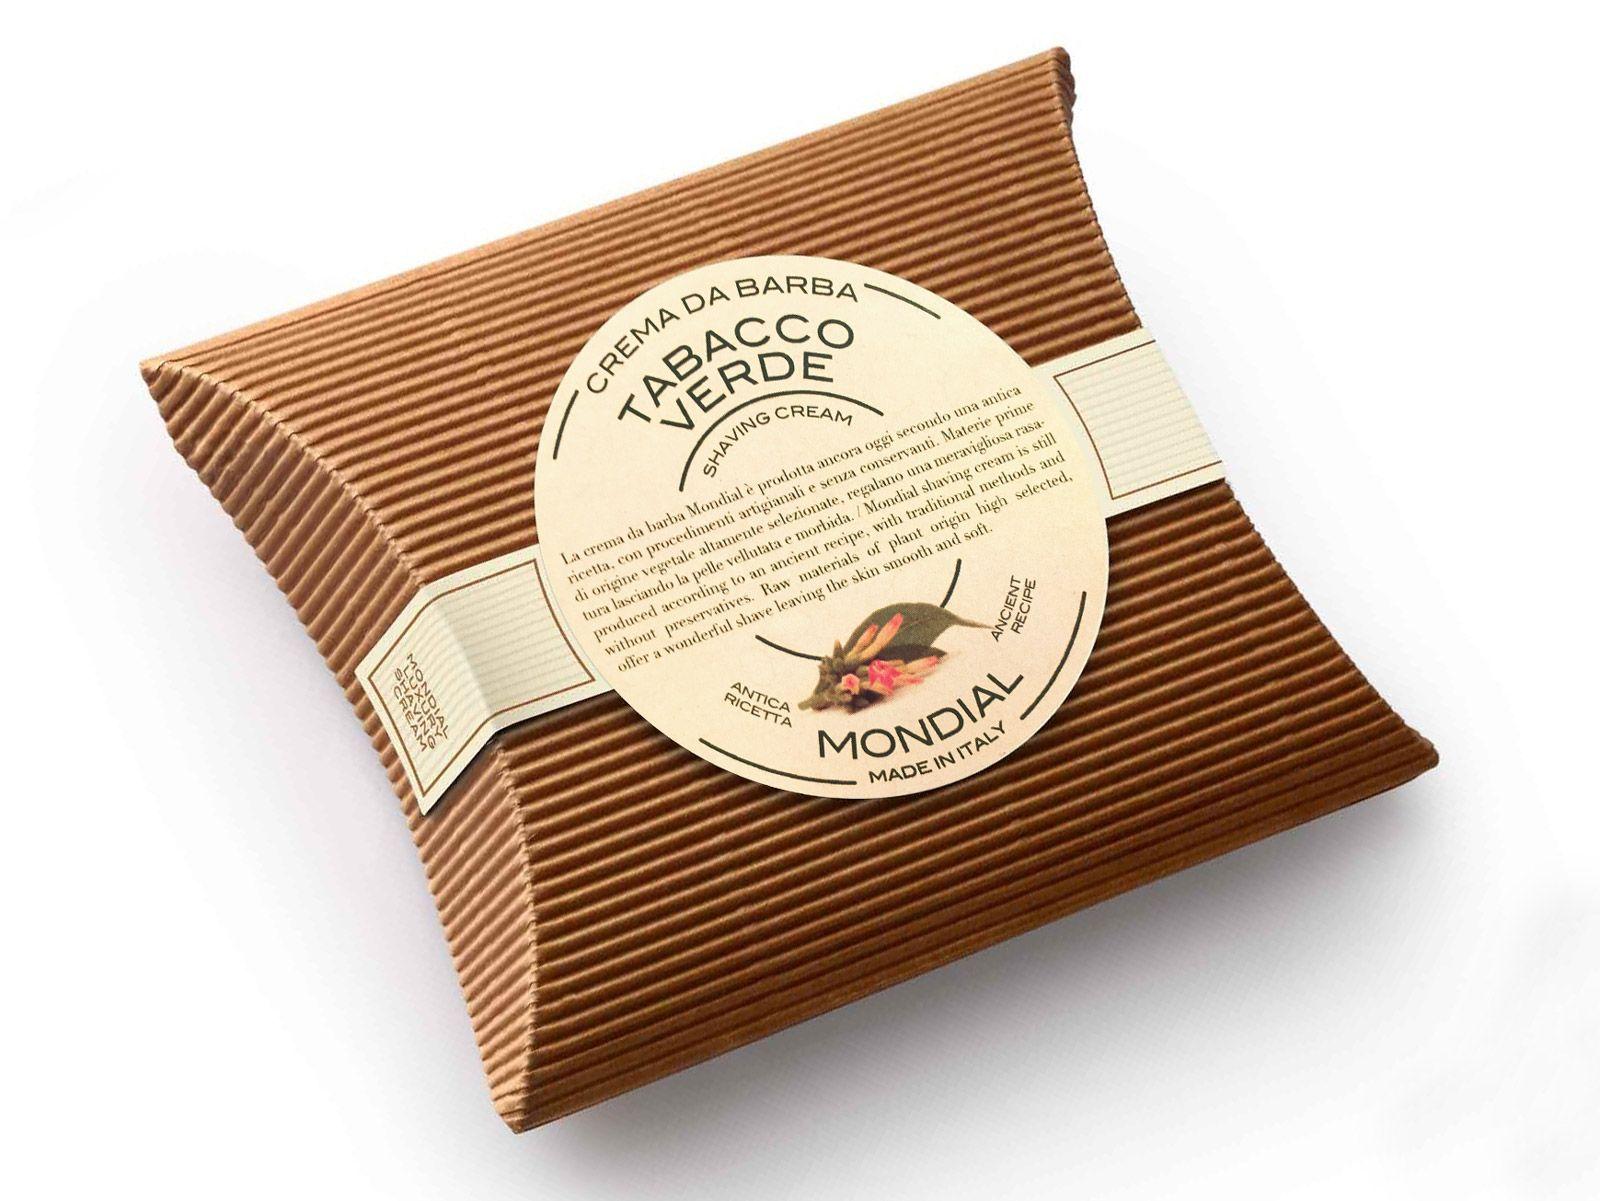 Wkład kremu do golenia Mondial Crema da Barba Tabacco Verde (Shaving Cream)